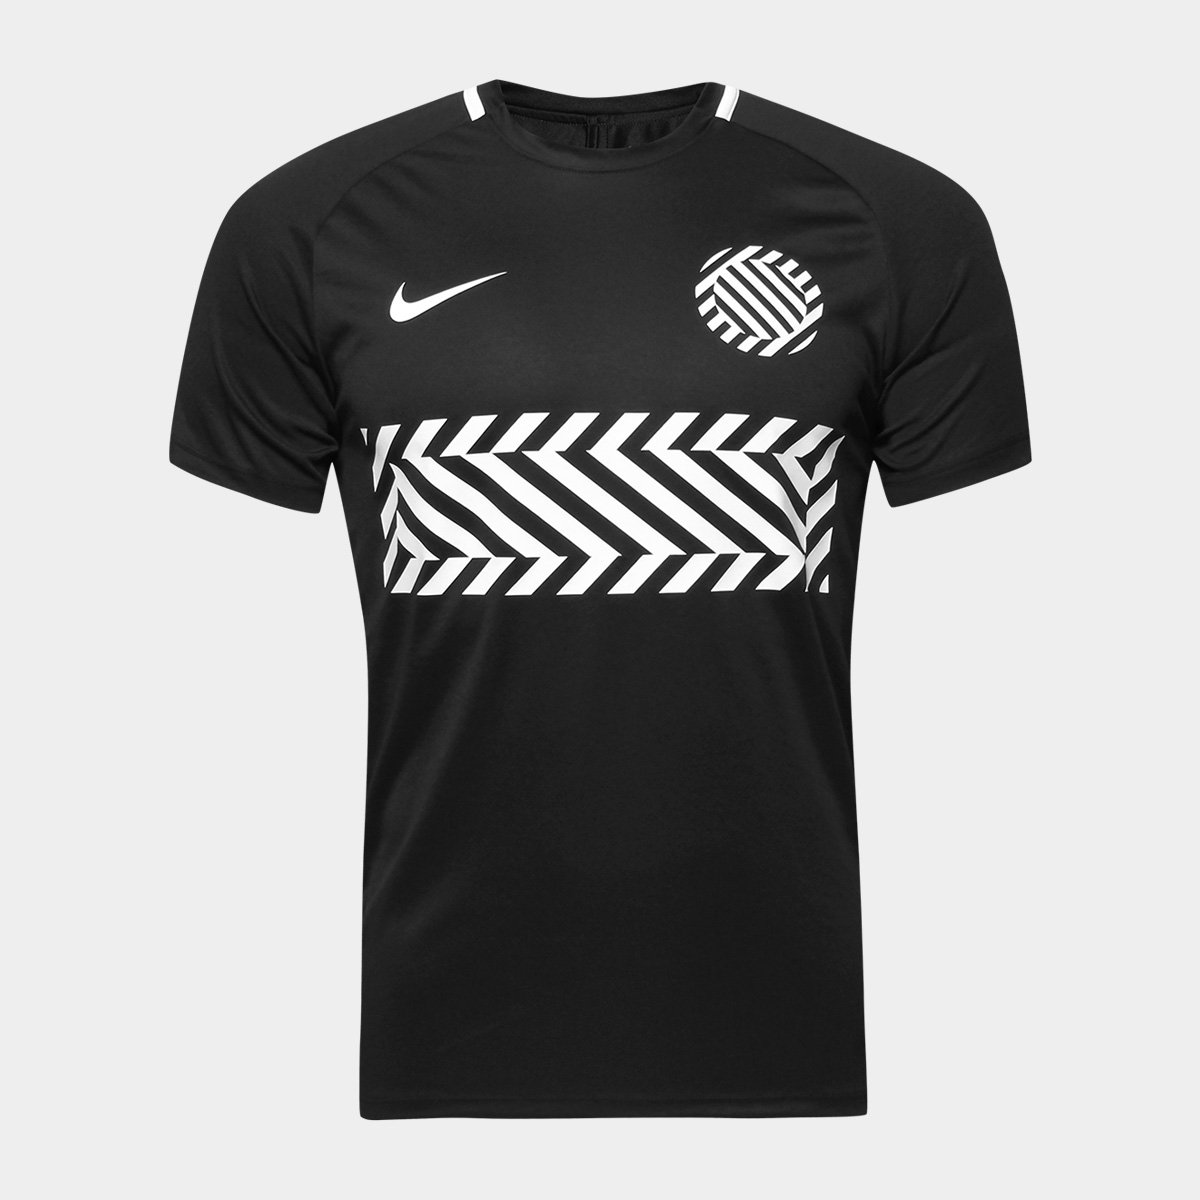 a0ea190792e6f Camisa Nike Dry Academy GX2 Masculina - Compre Agora